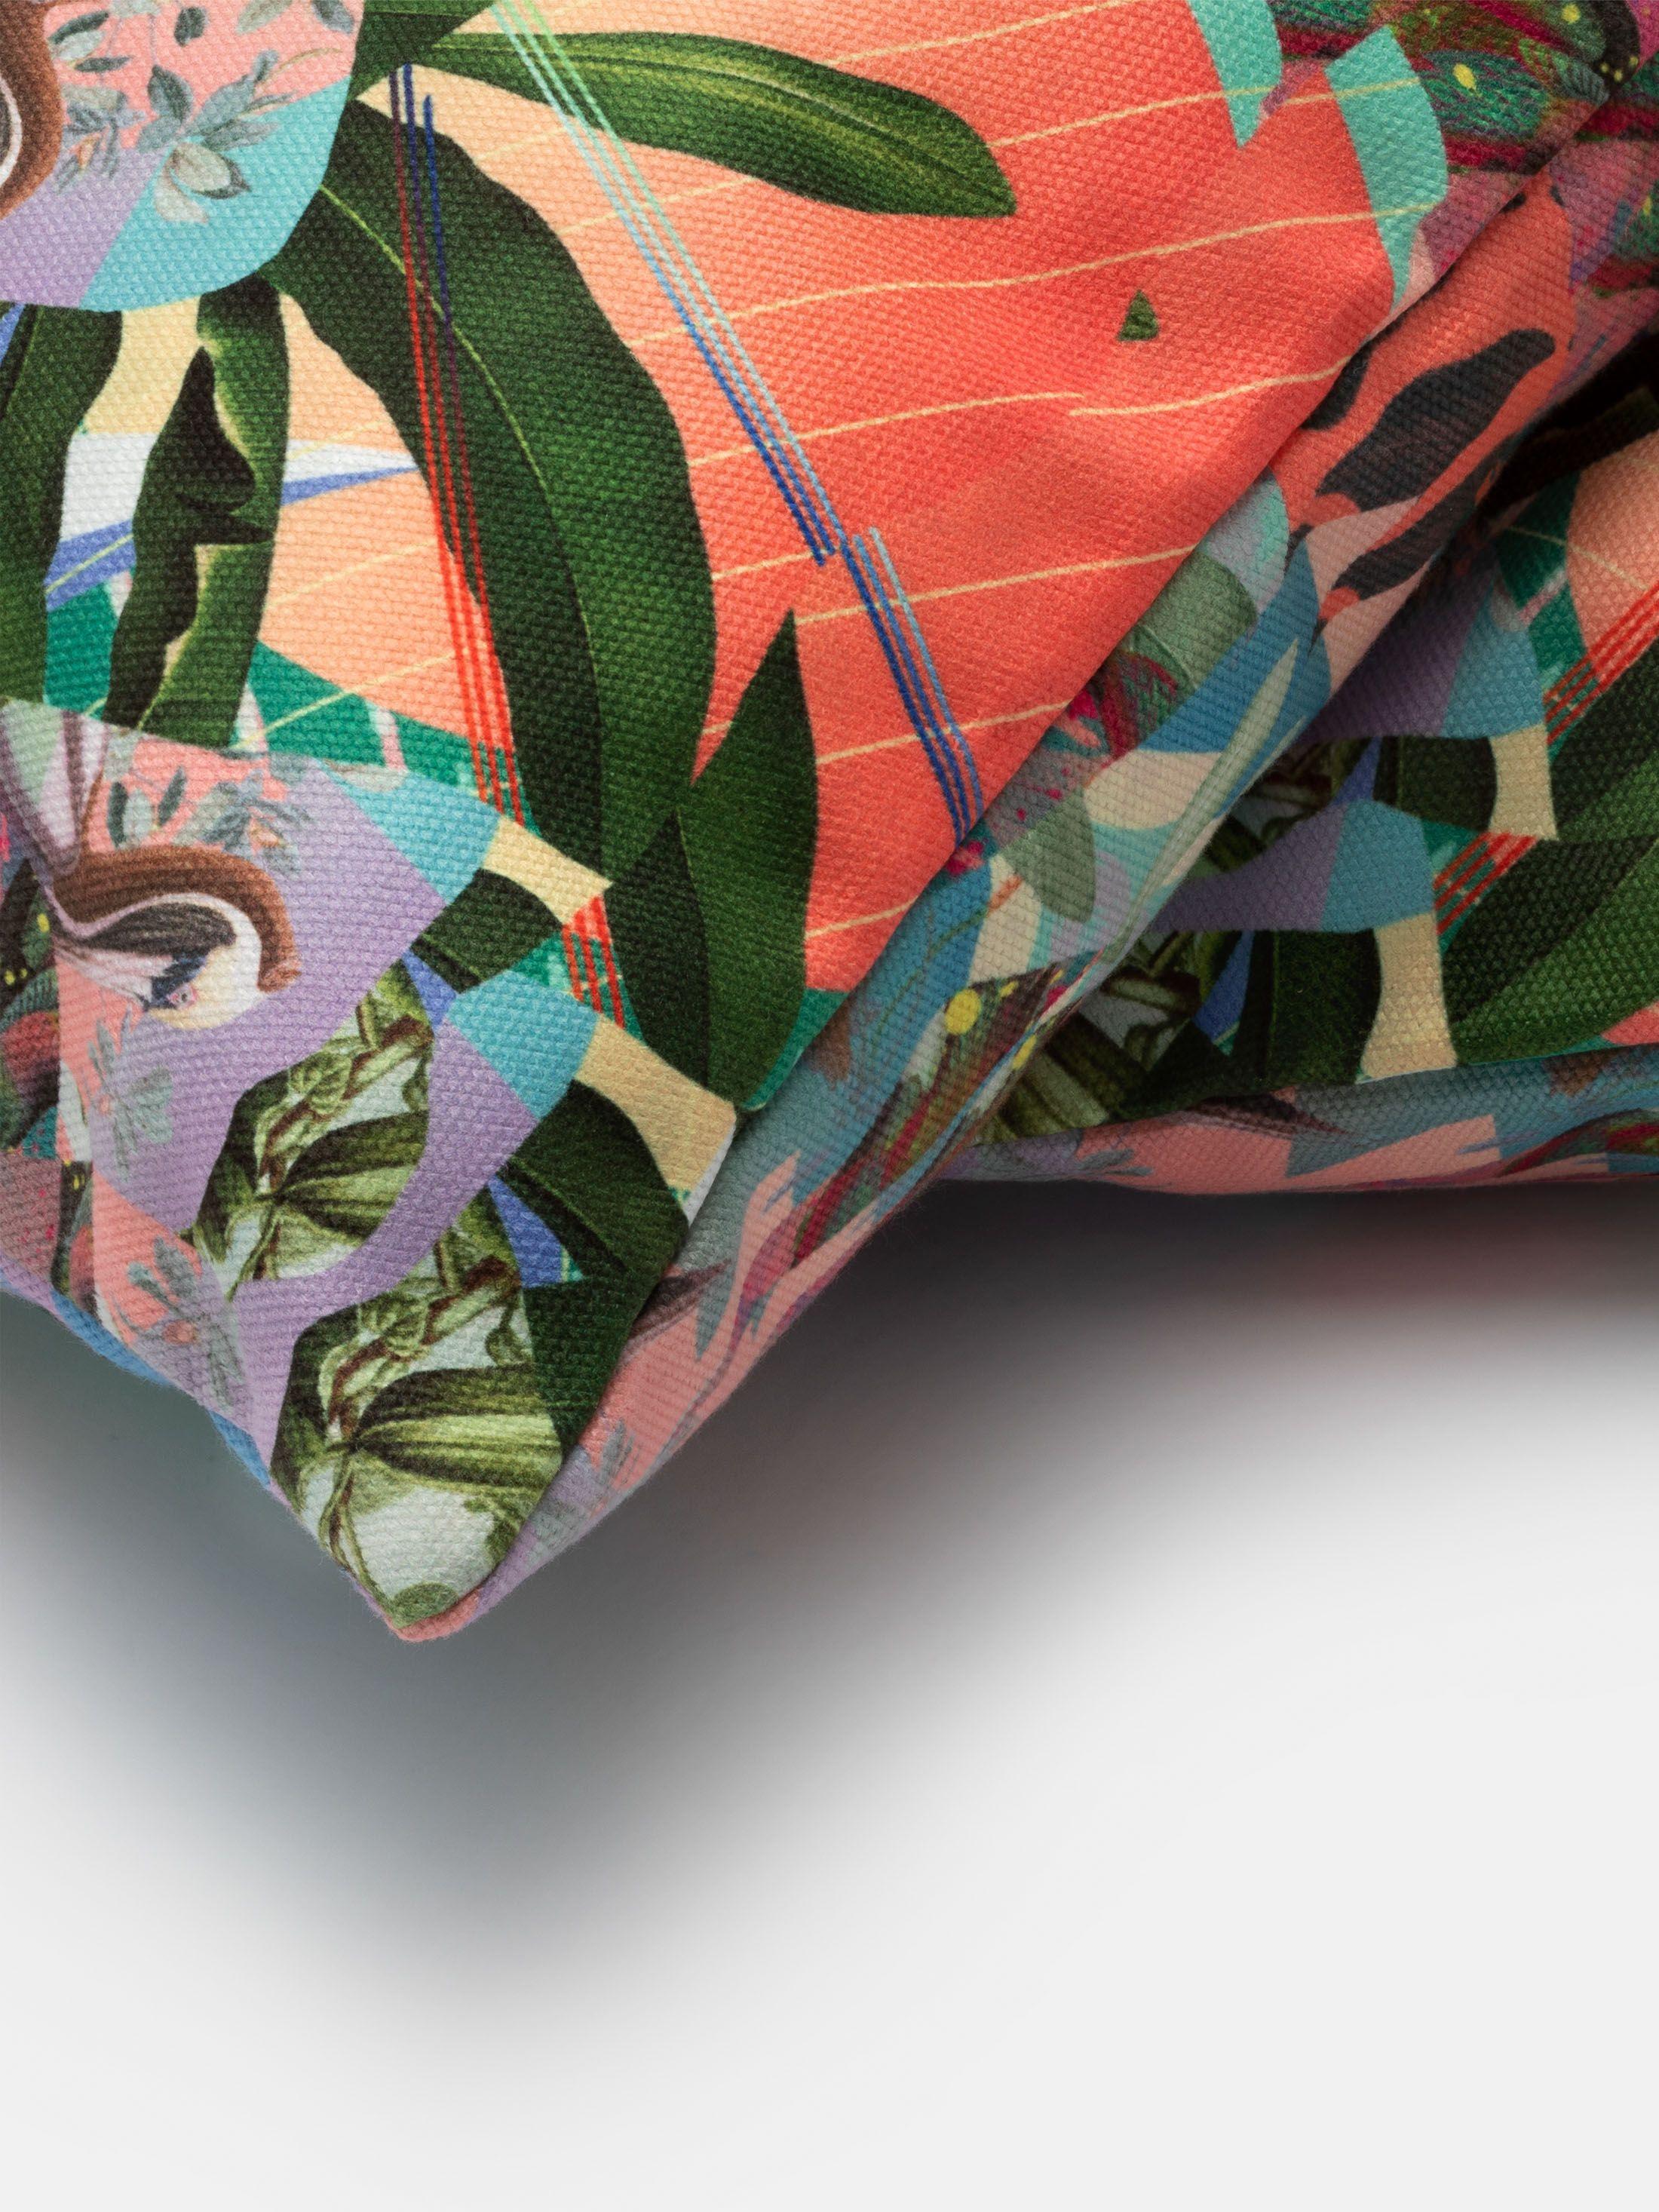 coussin customiséb avec motif boho